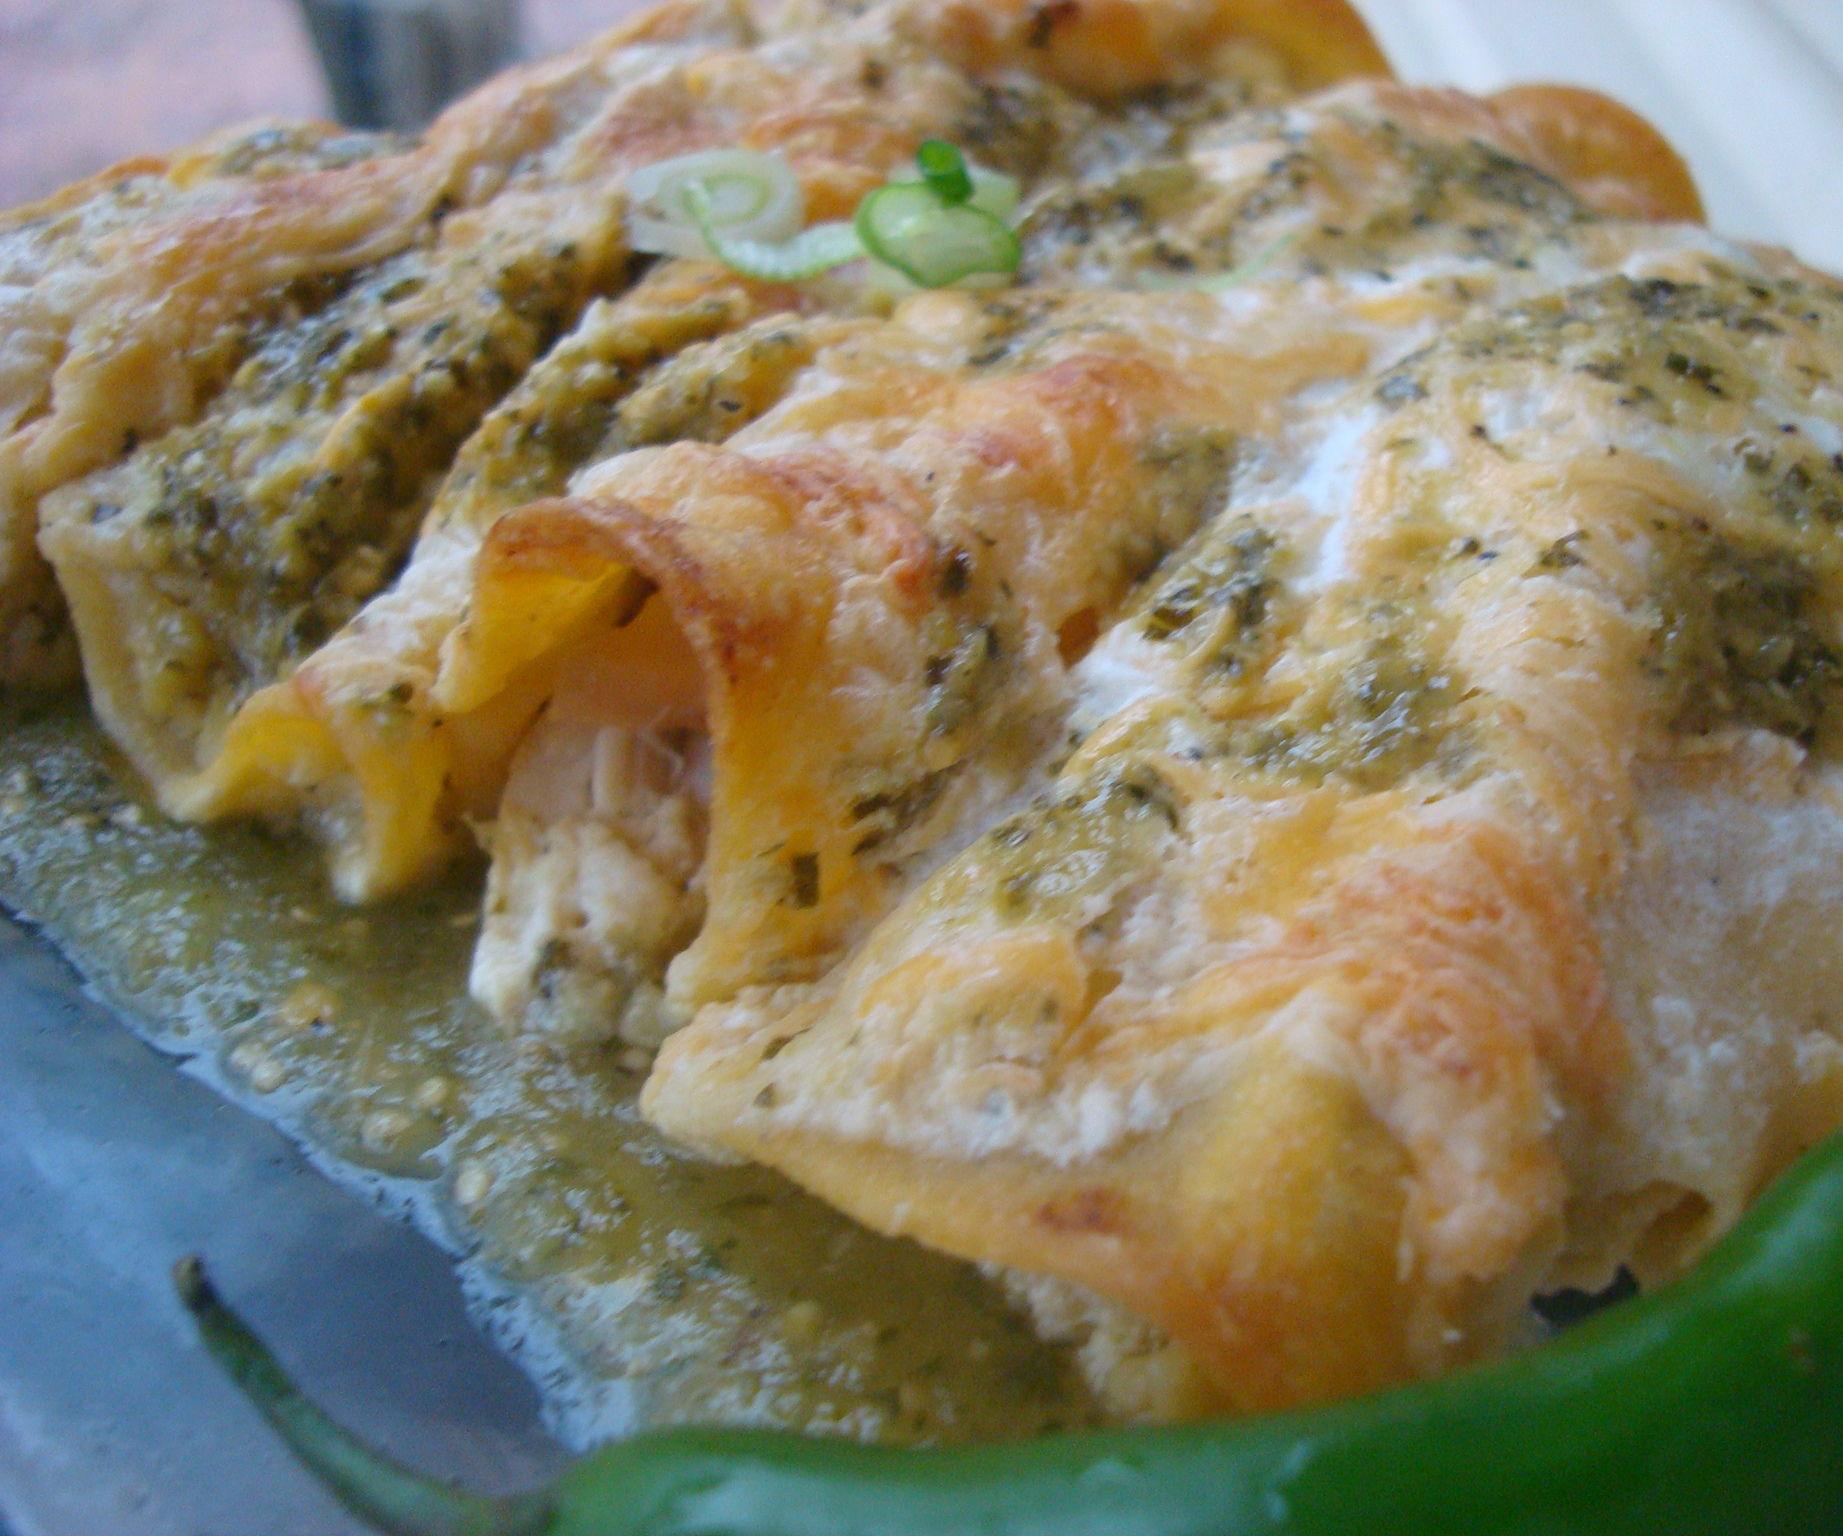 Chicken Enchilada with Tomatillo Sauce